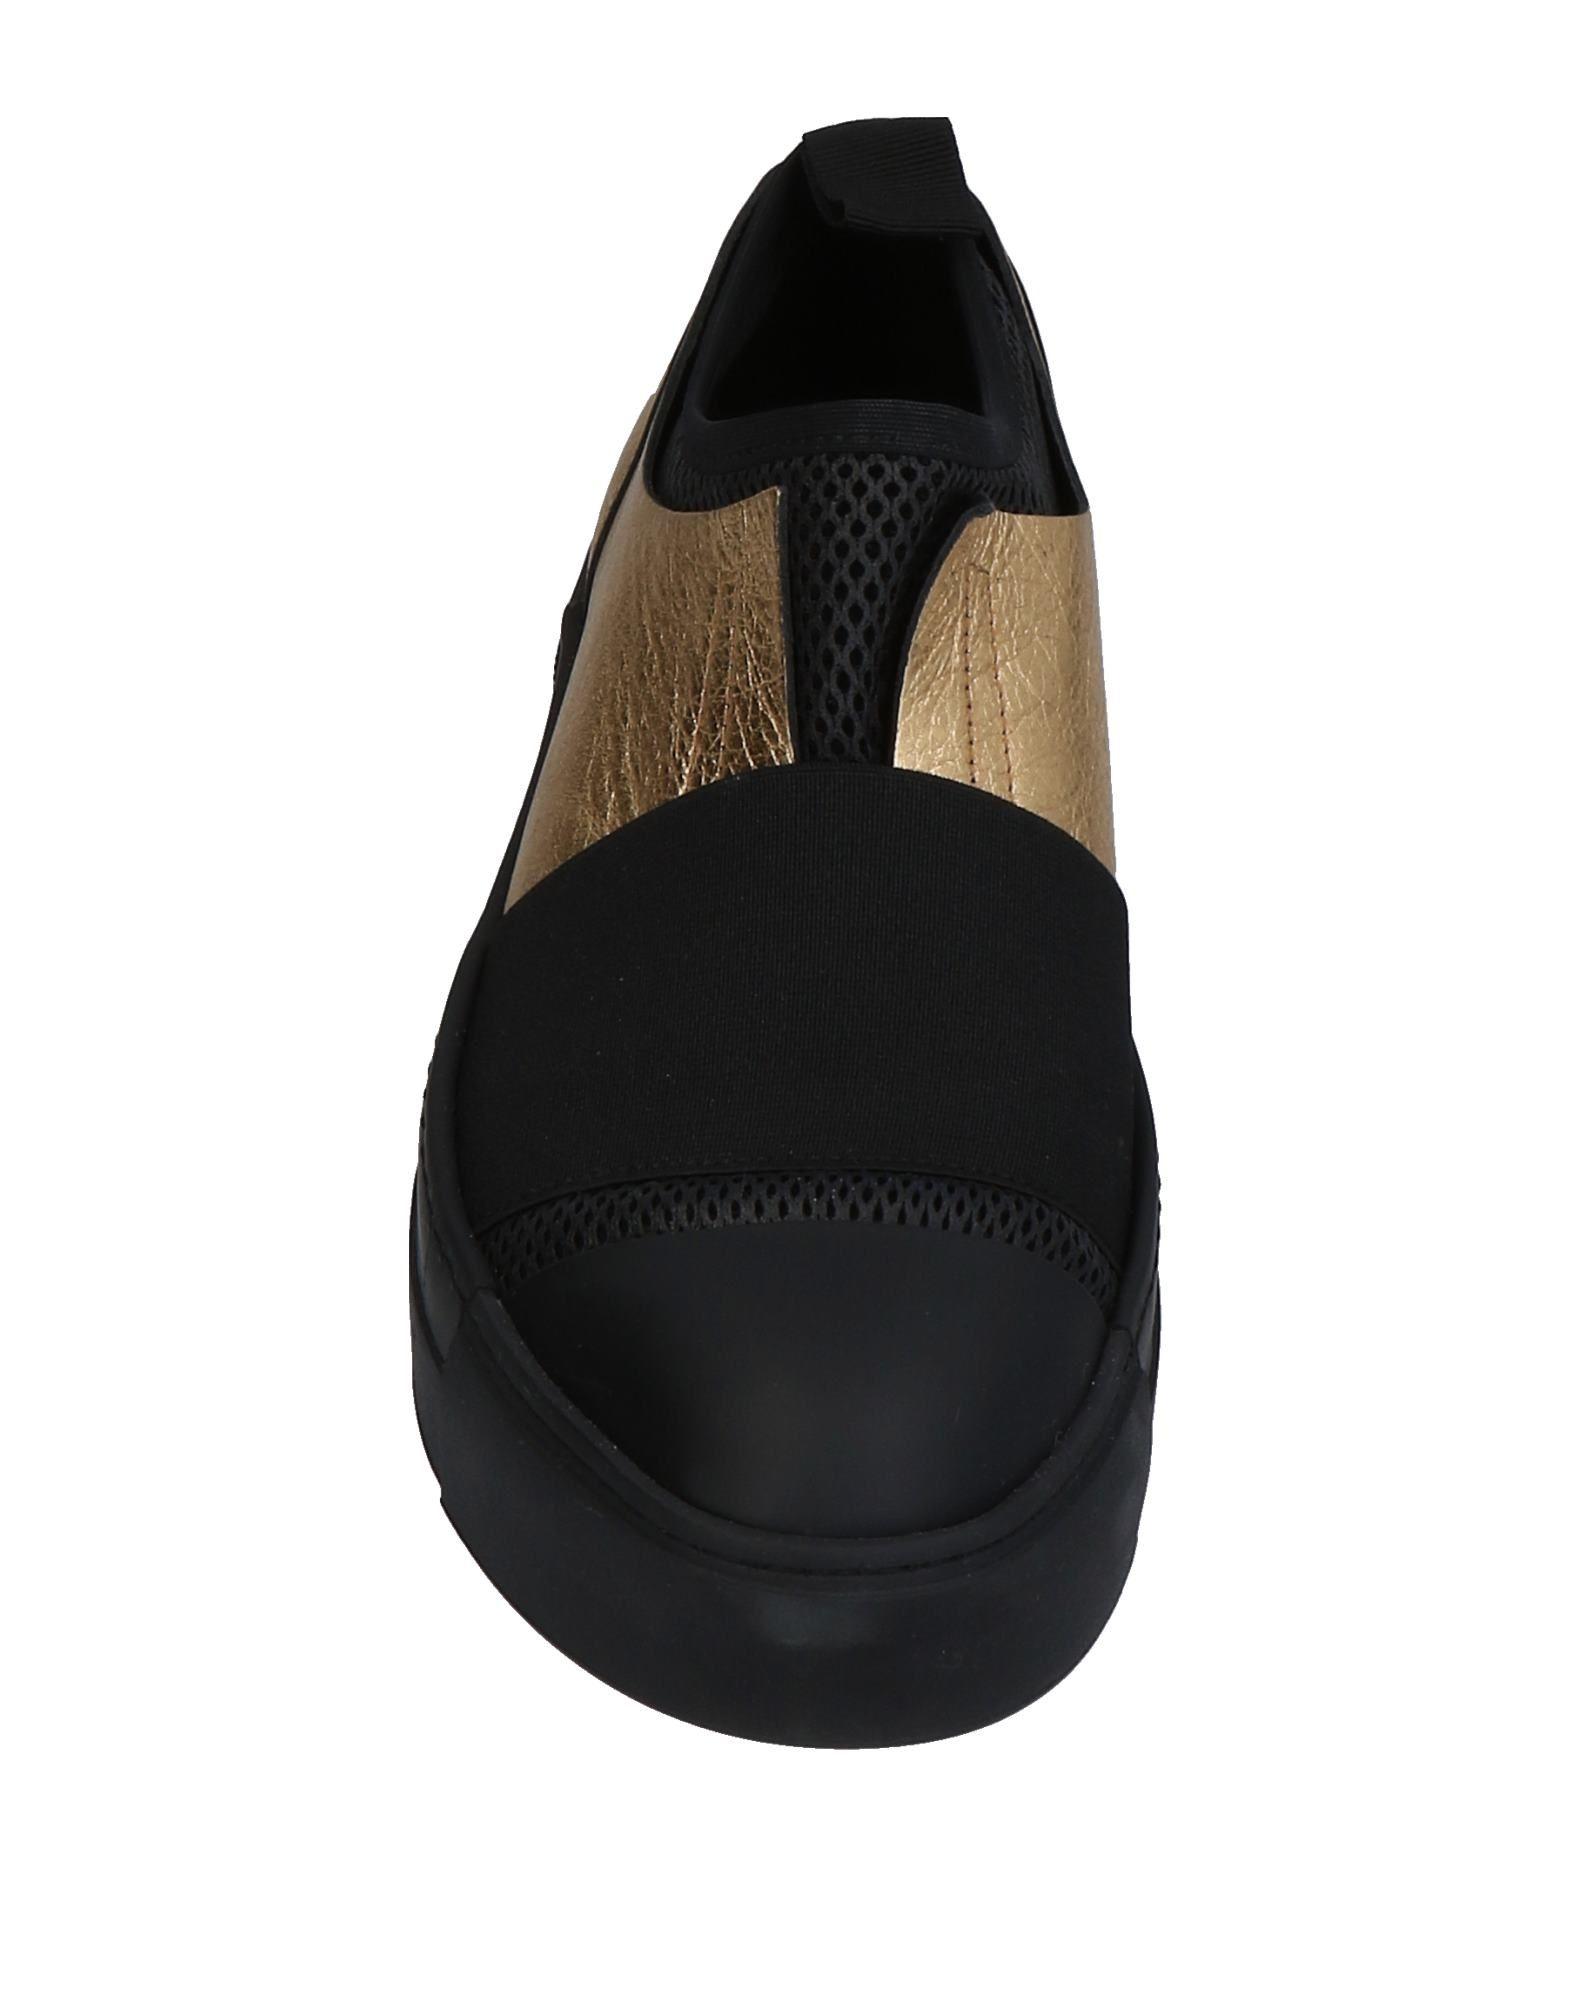 Stilvolle billige Schuhe Damen Vic Matiē Sneakers Damen Schuhe  11457581AN f11ddf